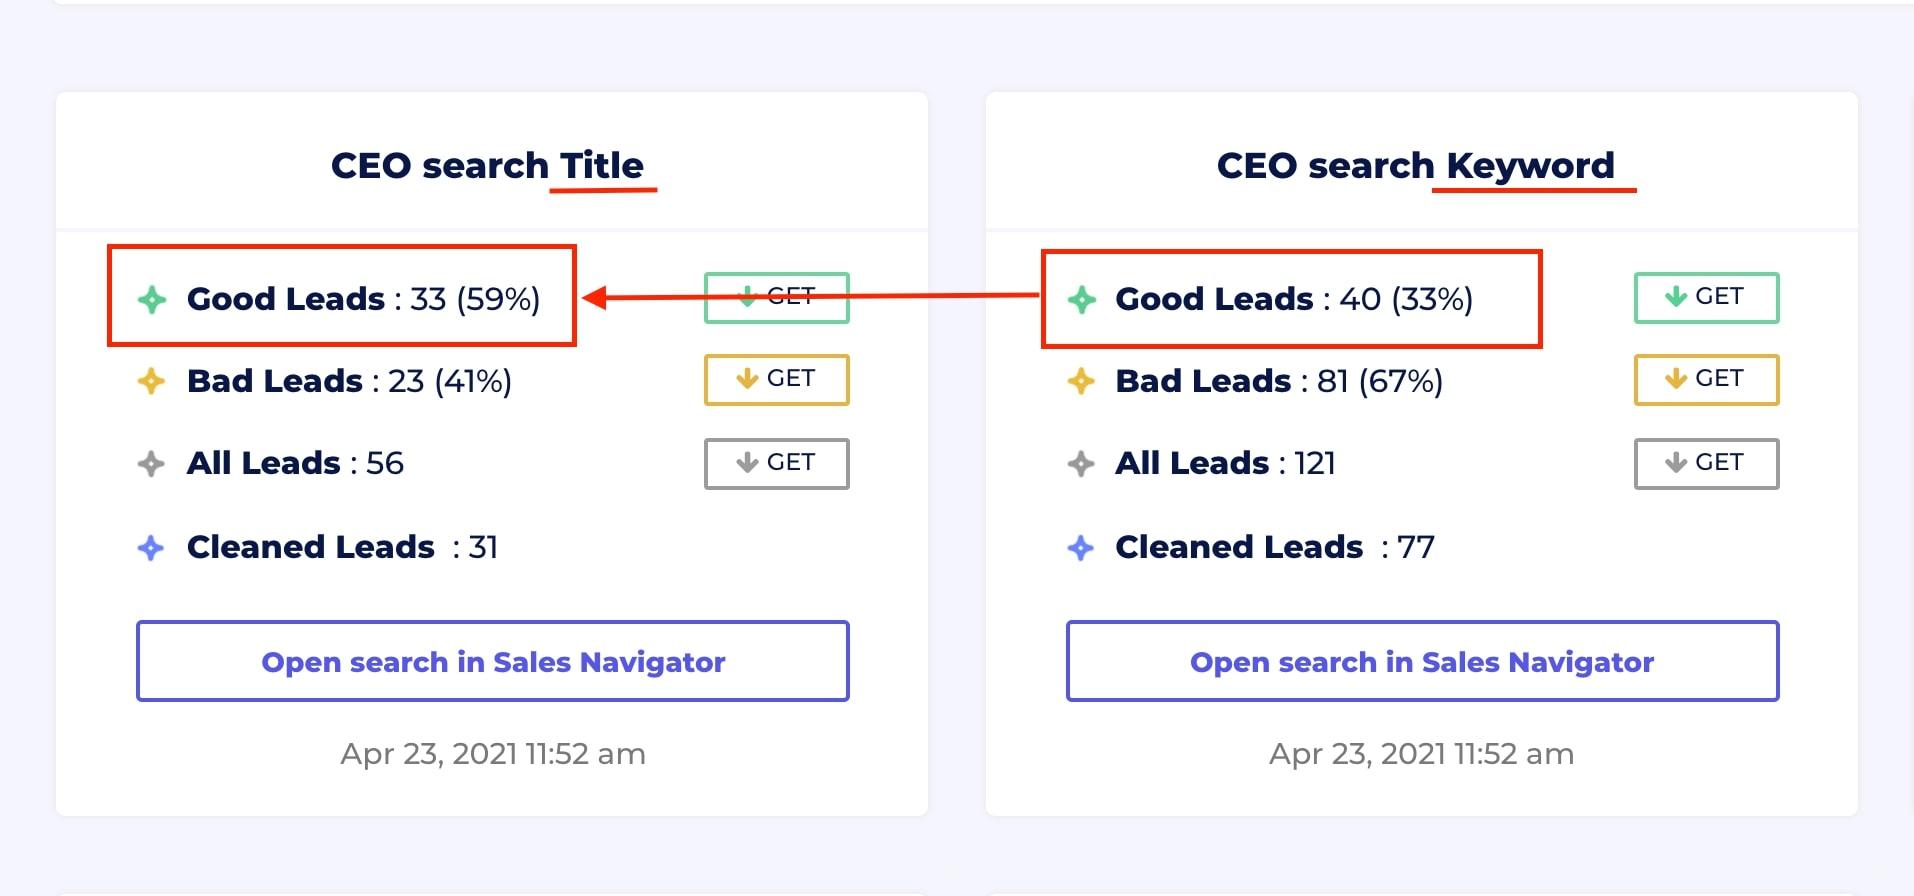 keyword vs title search sales navigator